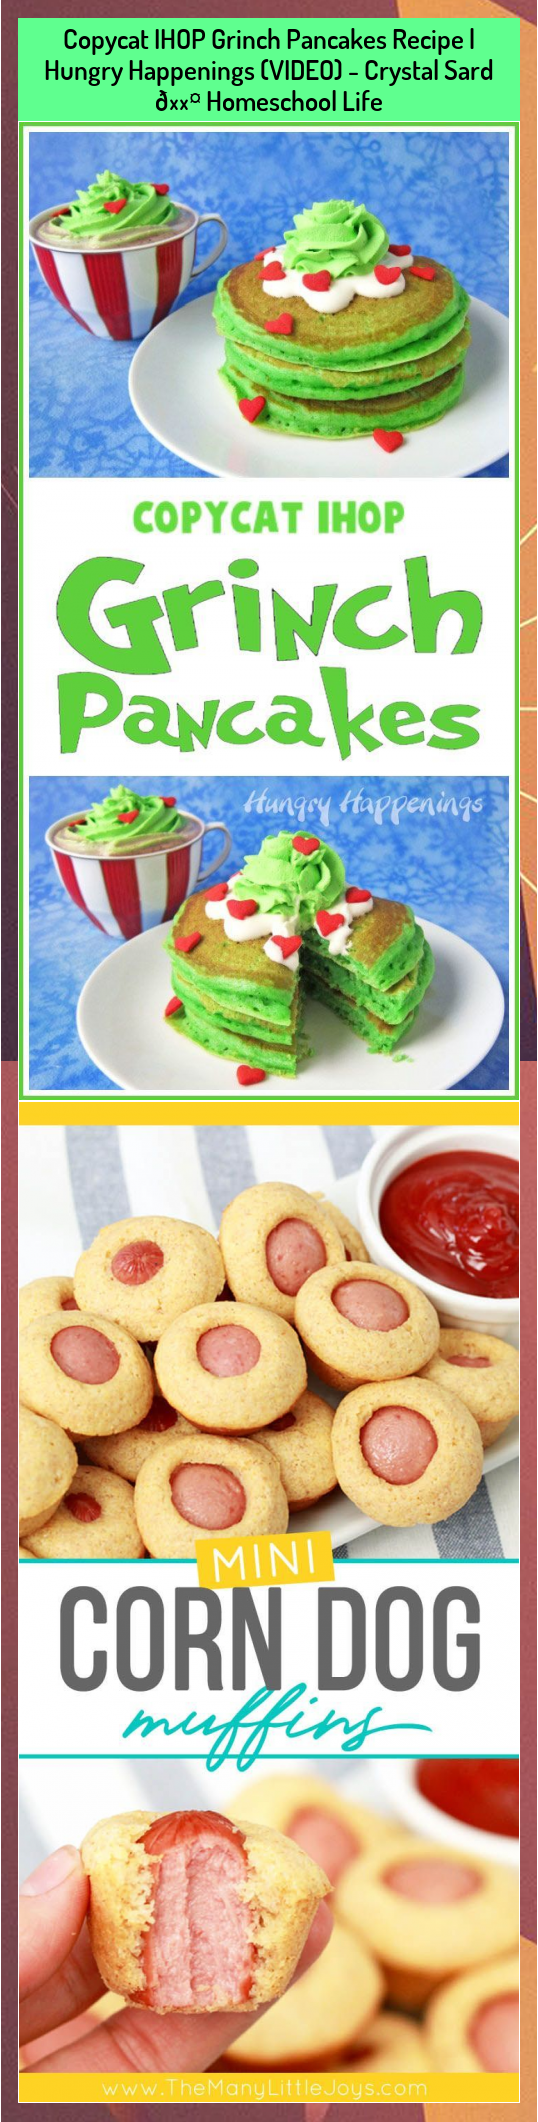 Copycat IHOP Grinch Pancakes Recipe | Hungry Happenings (VIDEO) - Crystal Sard 🖤 Homeschool Life #Copycat #Crystal #Grinch #Happenings #Homeschool #Hungry #IHOP #Life #pancakes #Recipe #Sard #VIDEO